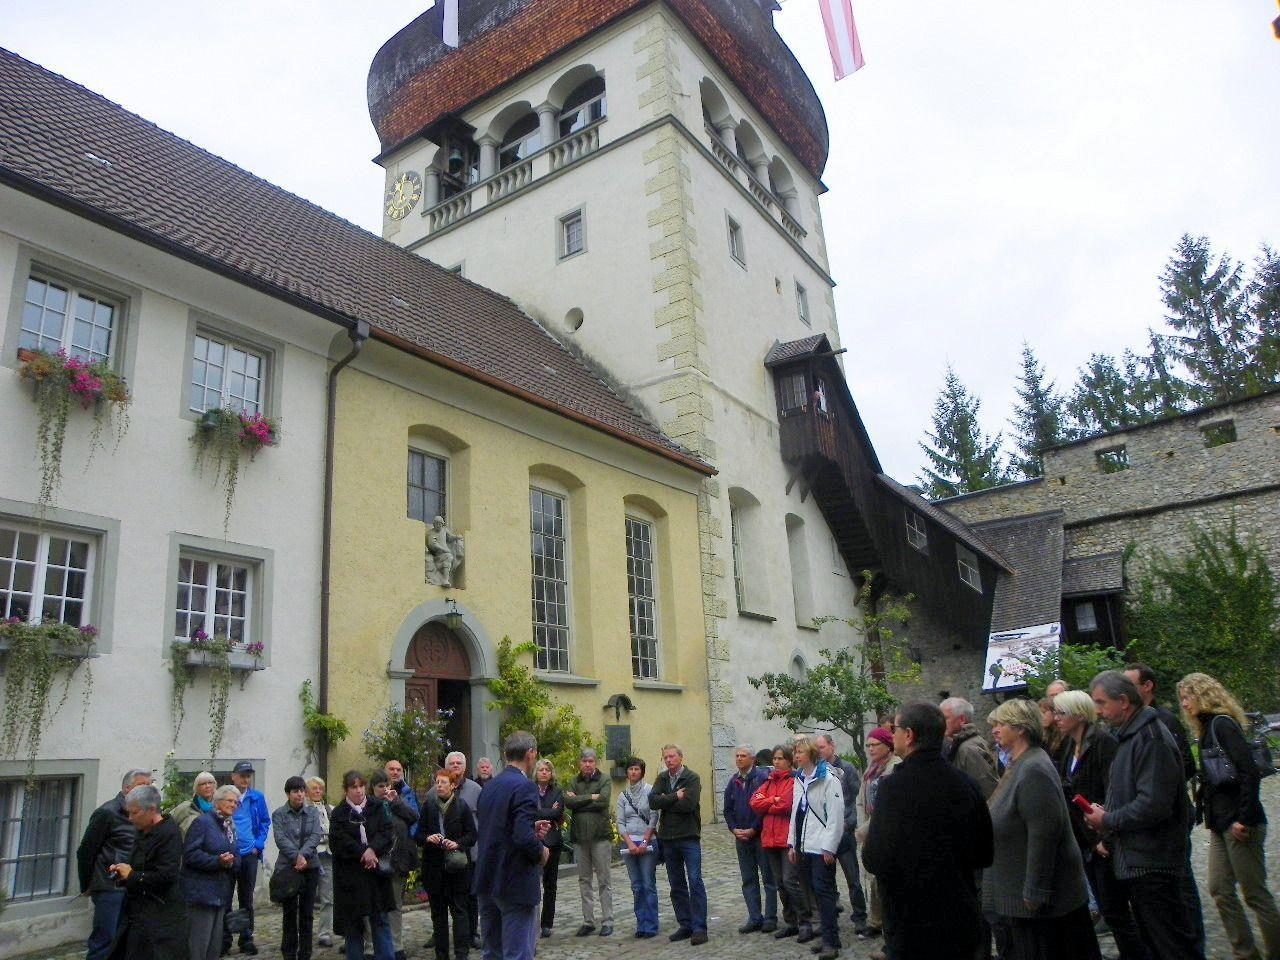 Martinsturm als Besuchermagnet